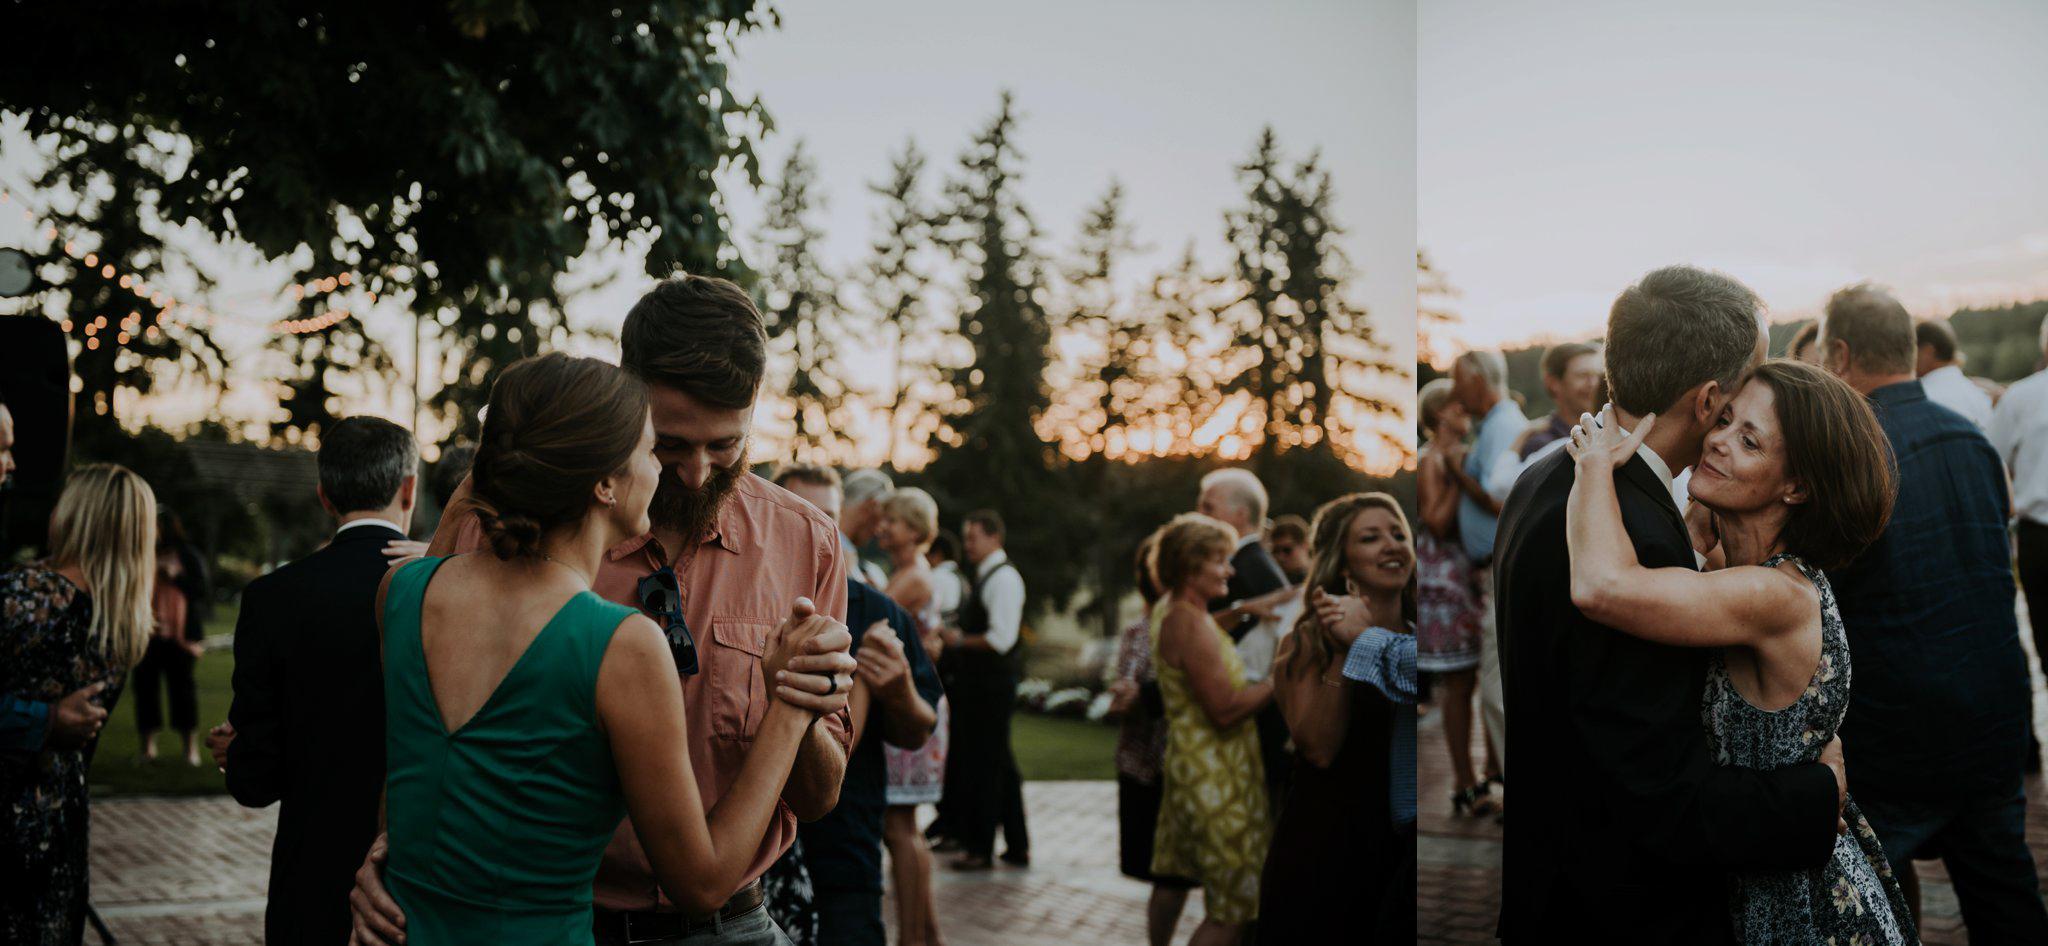 kristen-and-cody-the-kelley-farm-wedding-seattle-photographer-caitlyn-nikula-108.jpg